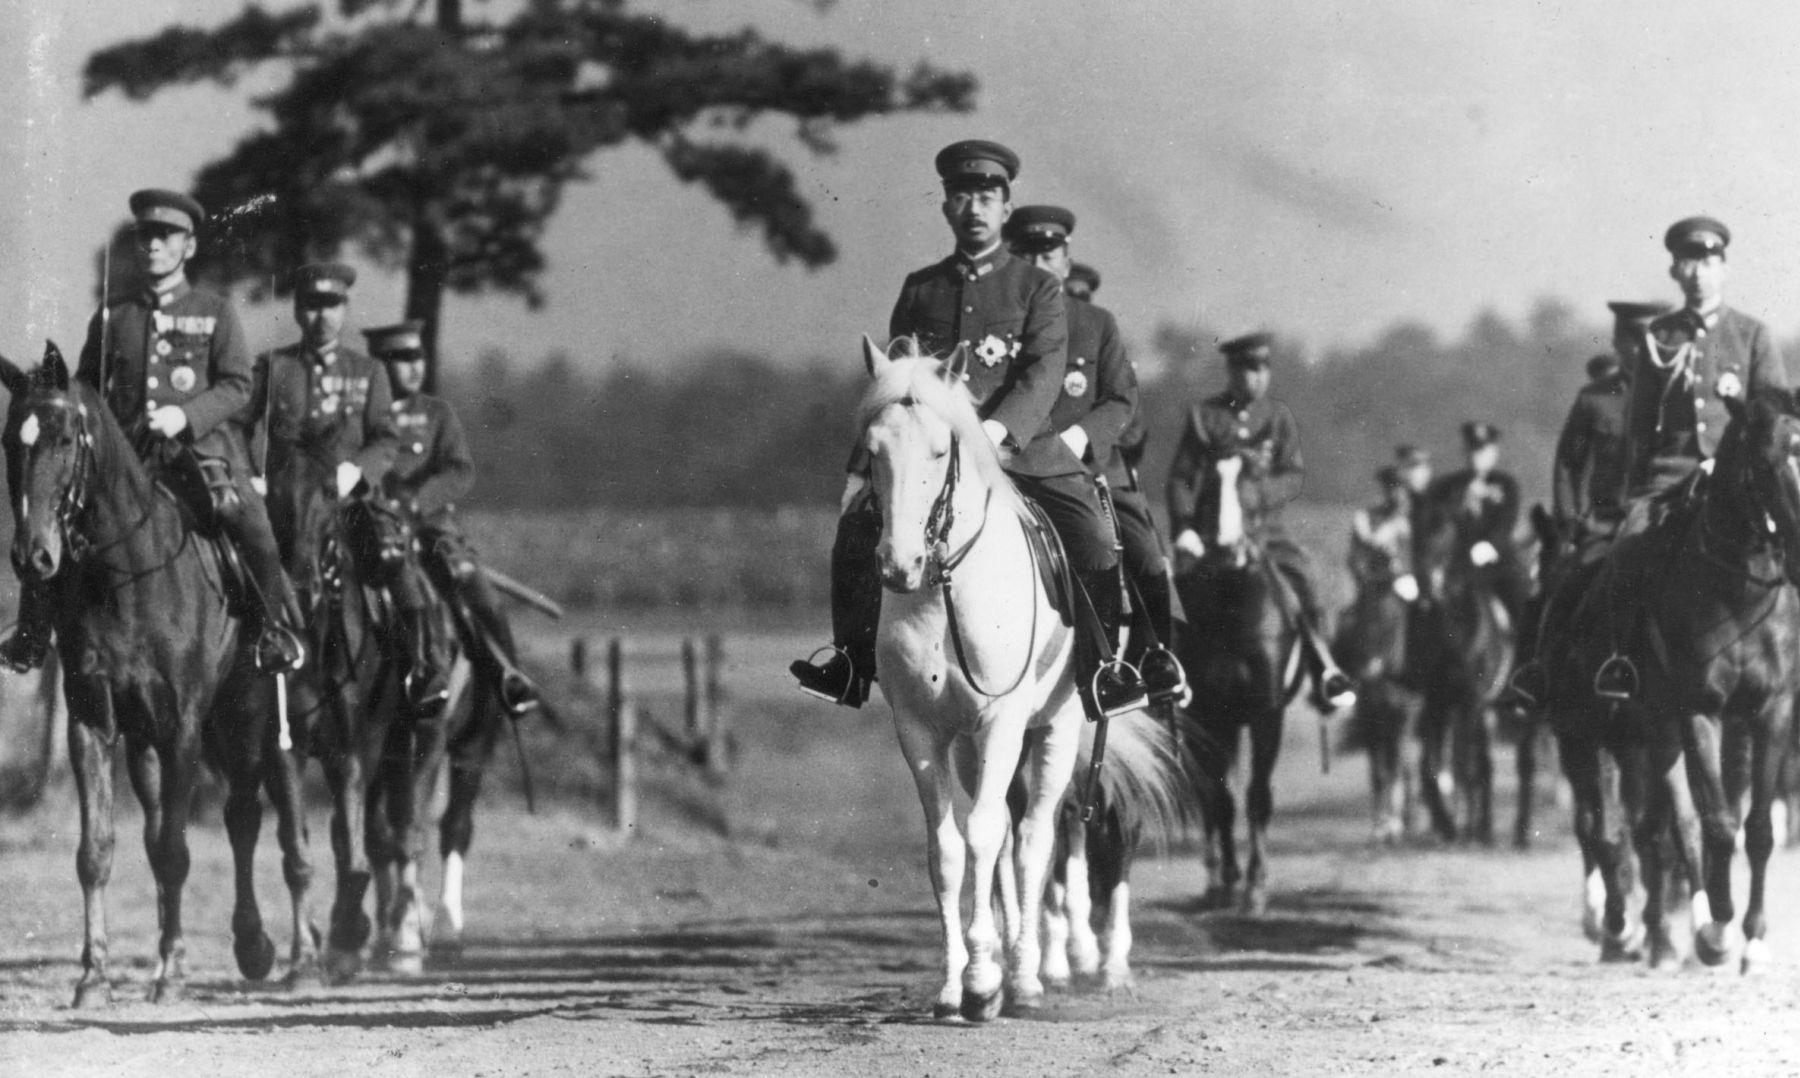 Emperor Showa Favored Japans Rearmament, Documents Reveal 002